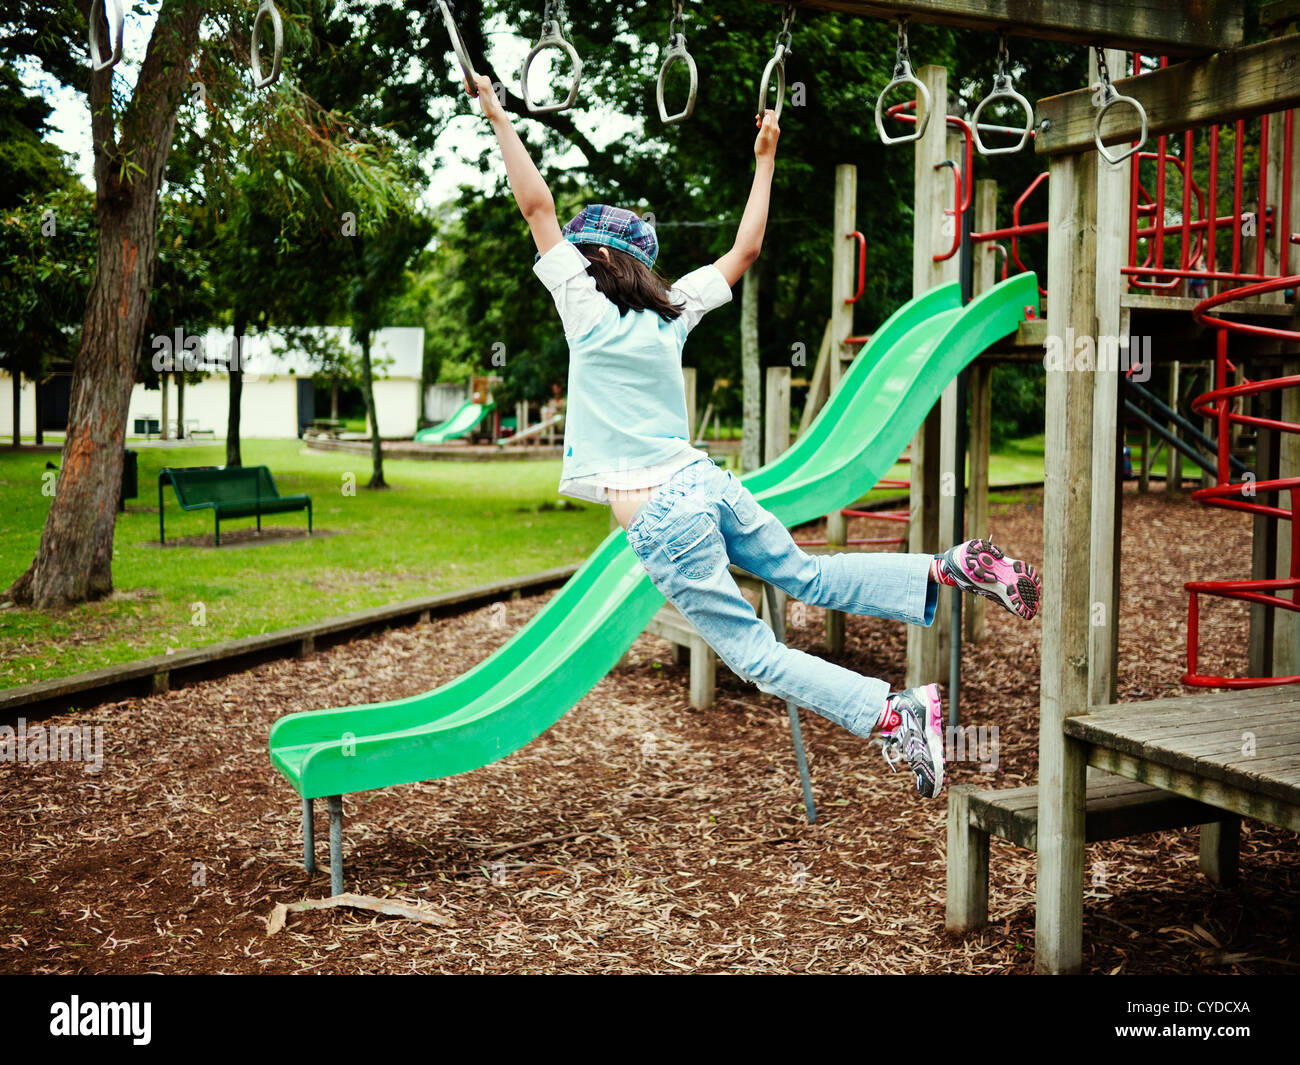 Children swing on monkey bars in adventure playground, New Zealand. - Stock Image